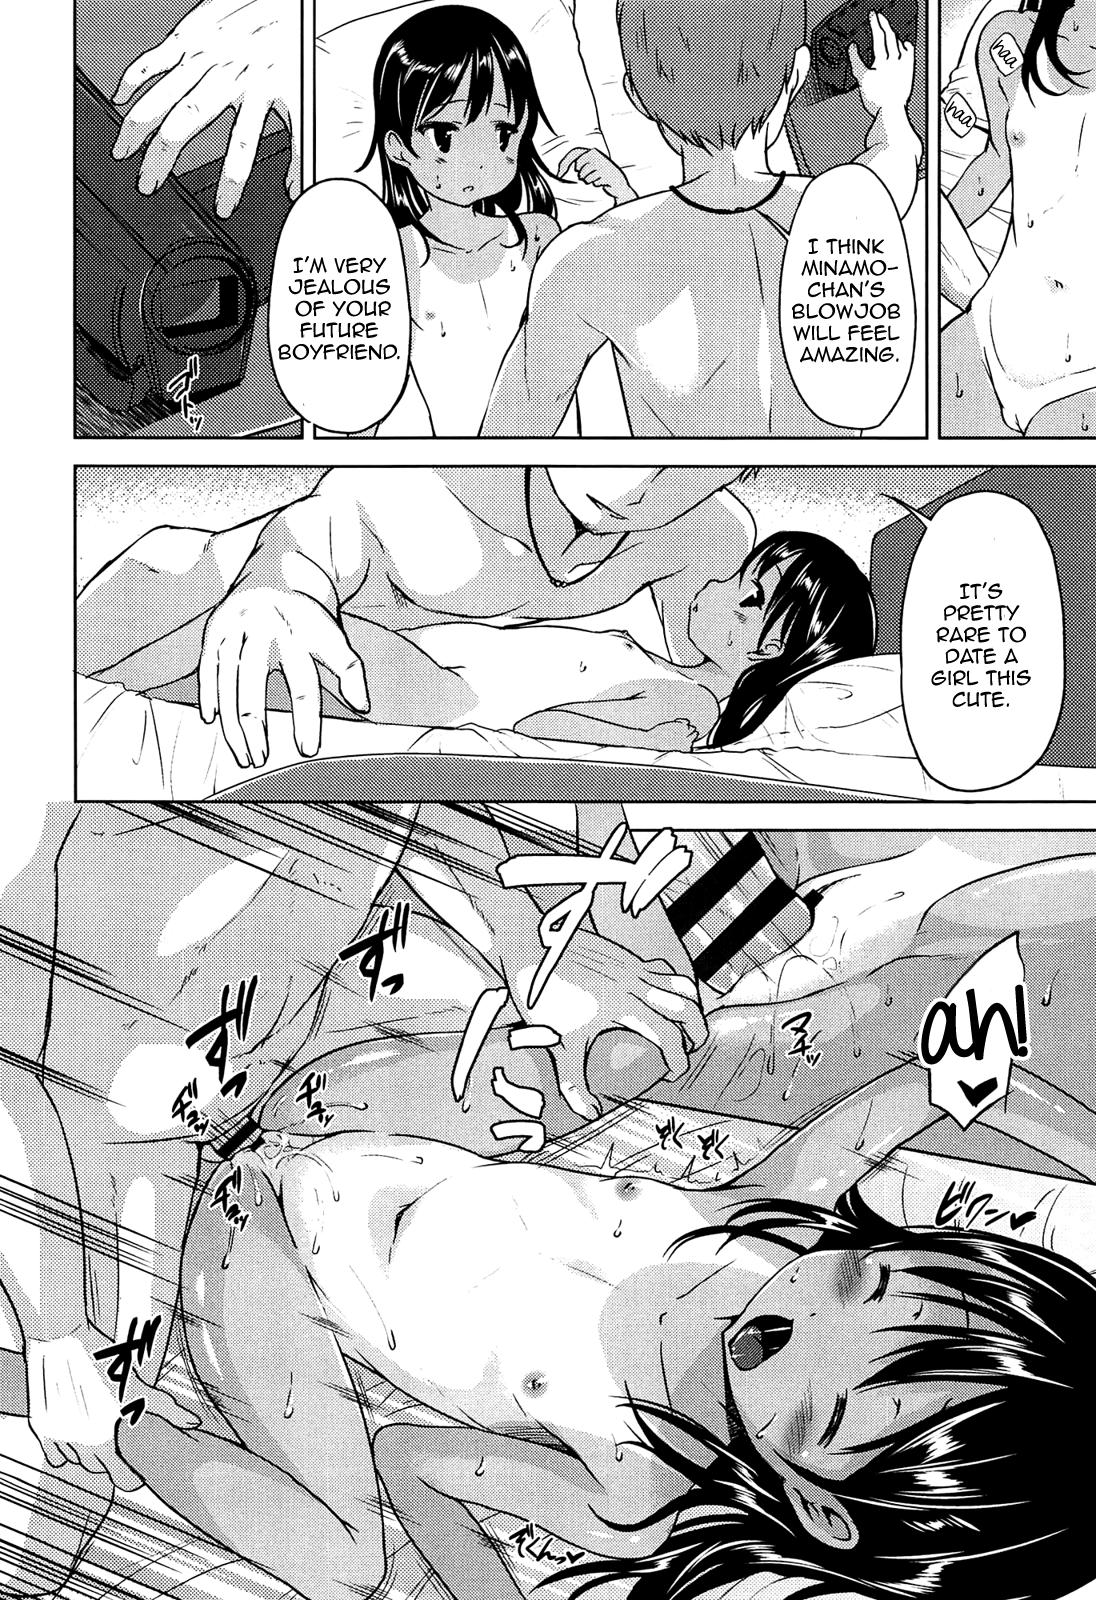 [Misao.] Hajimete Janai yo?   It's not Your First Time? [English] {5 a.m.} + [Rin] 178